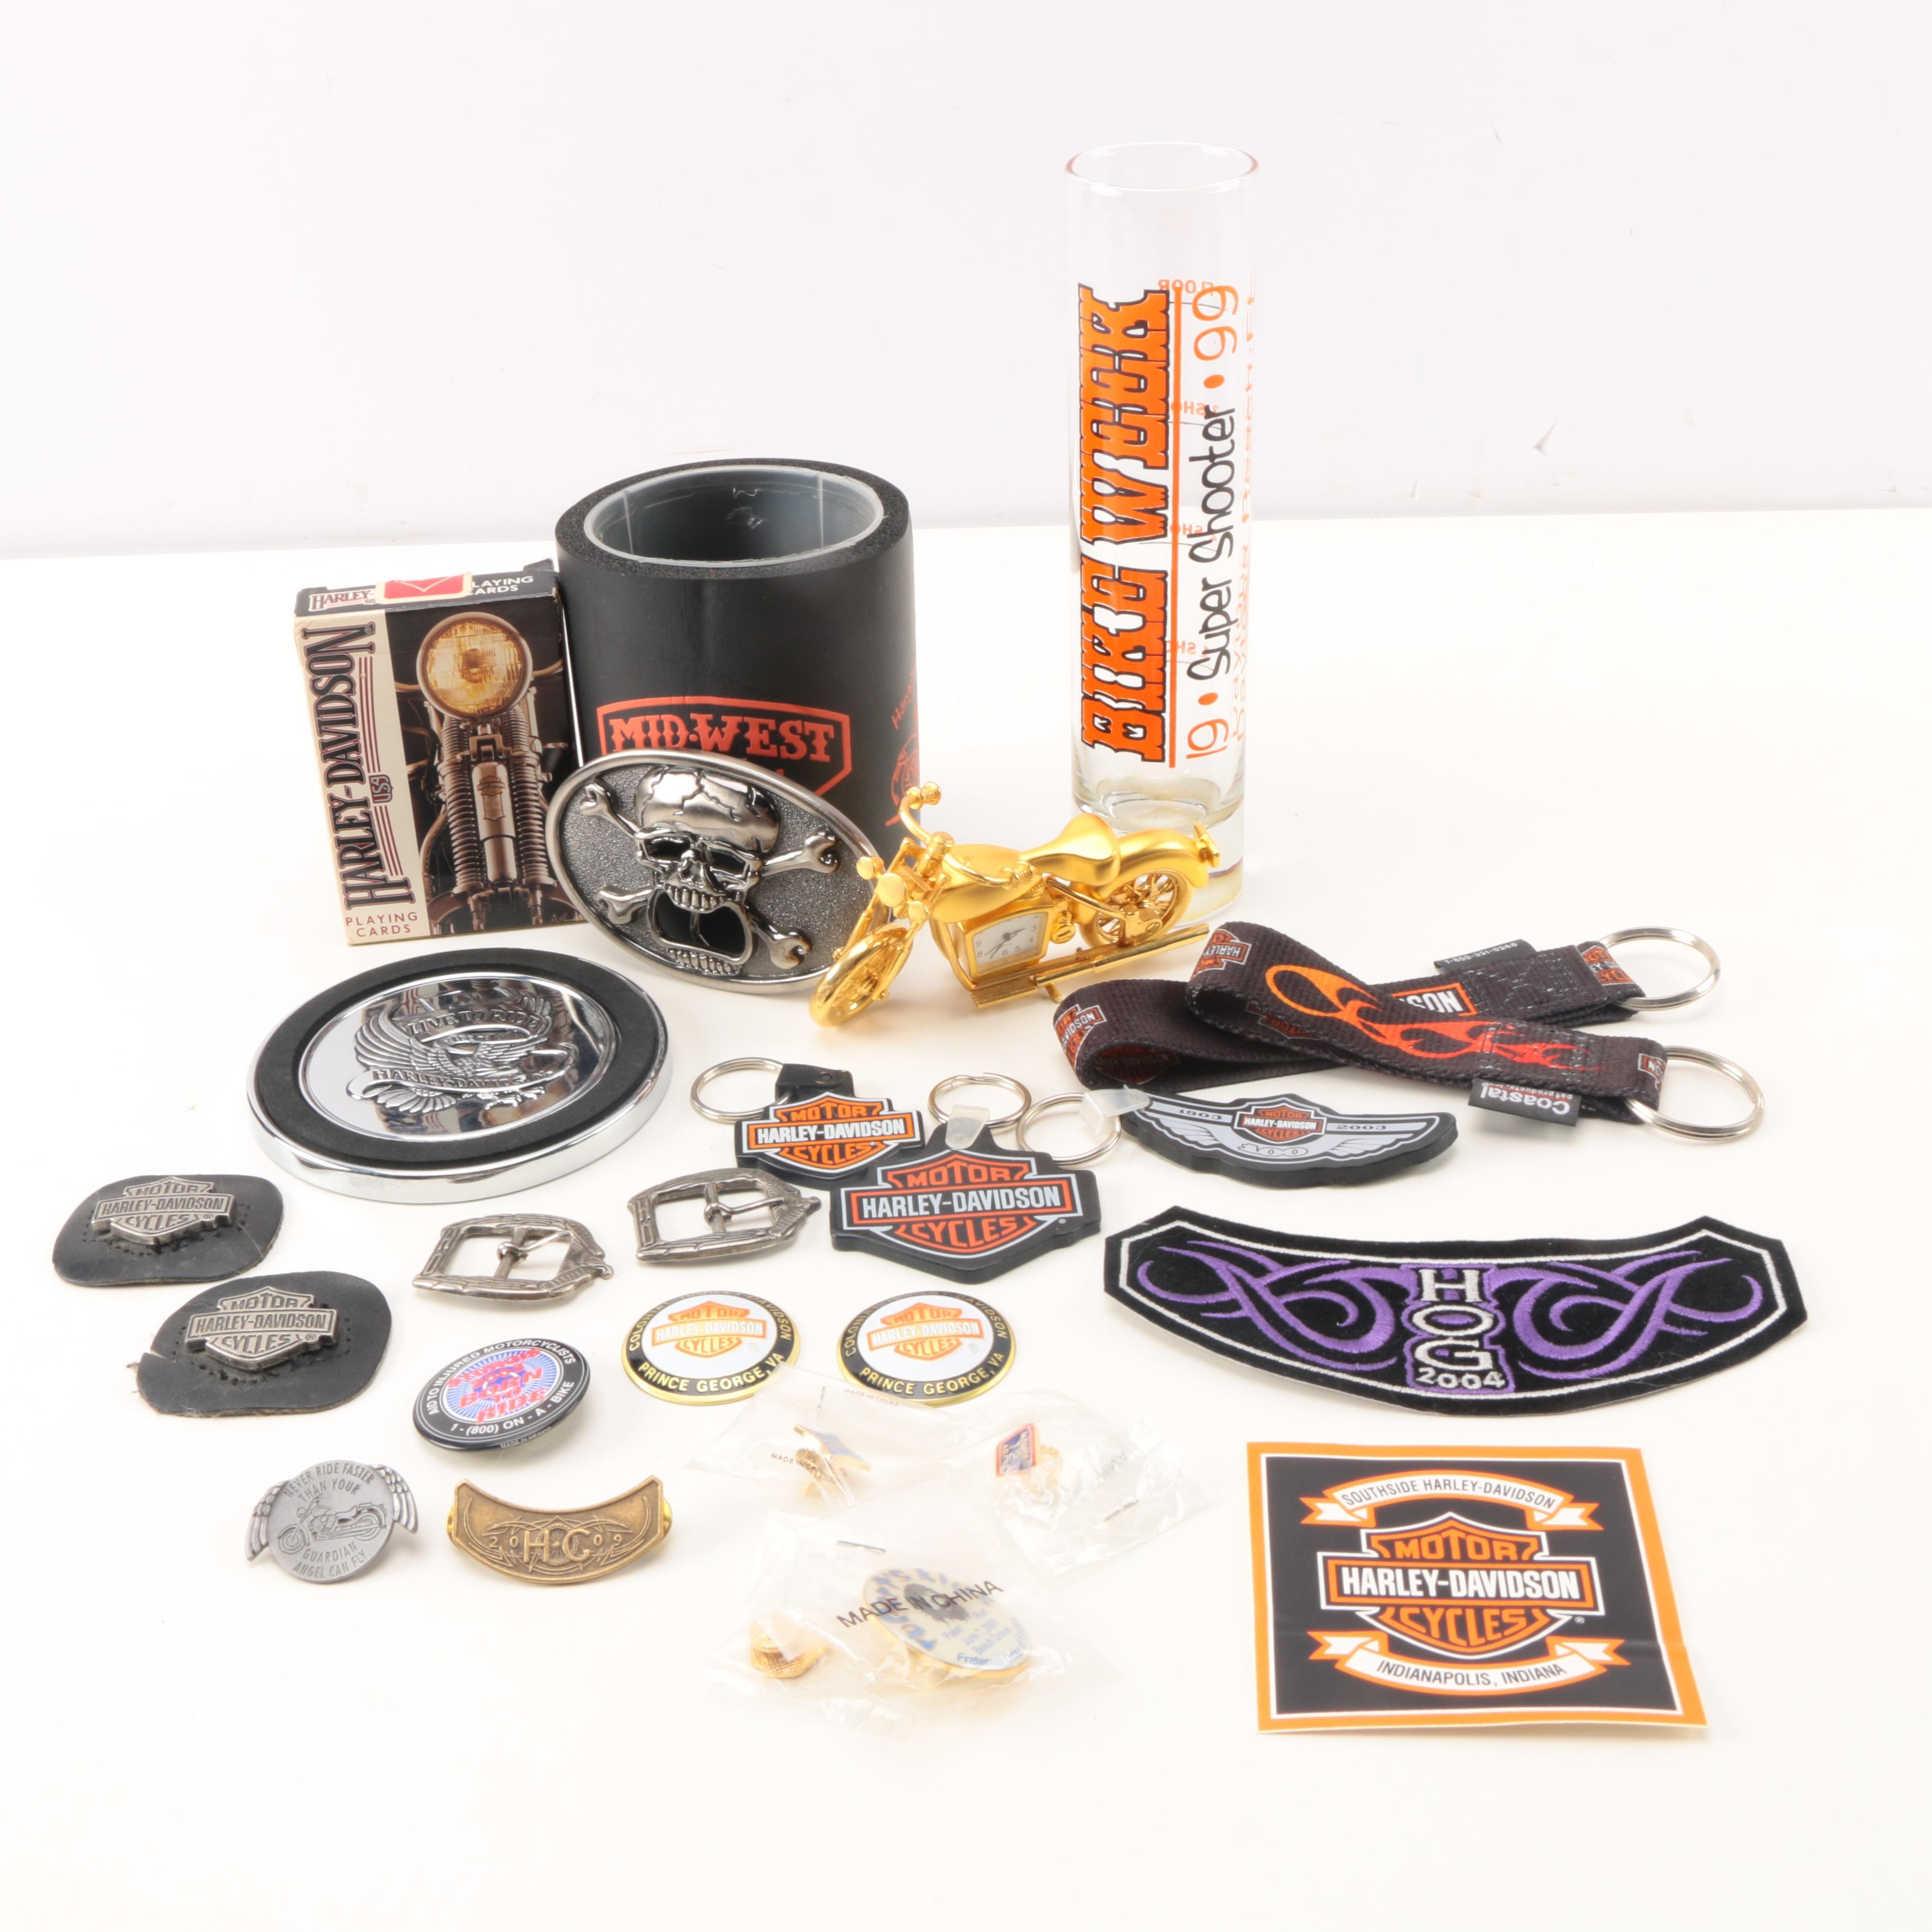 Harley Davidson Branded Items